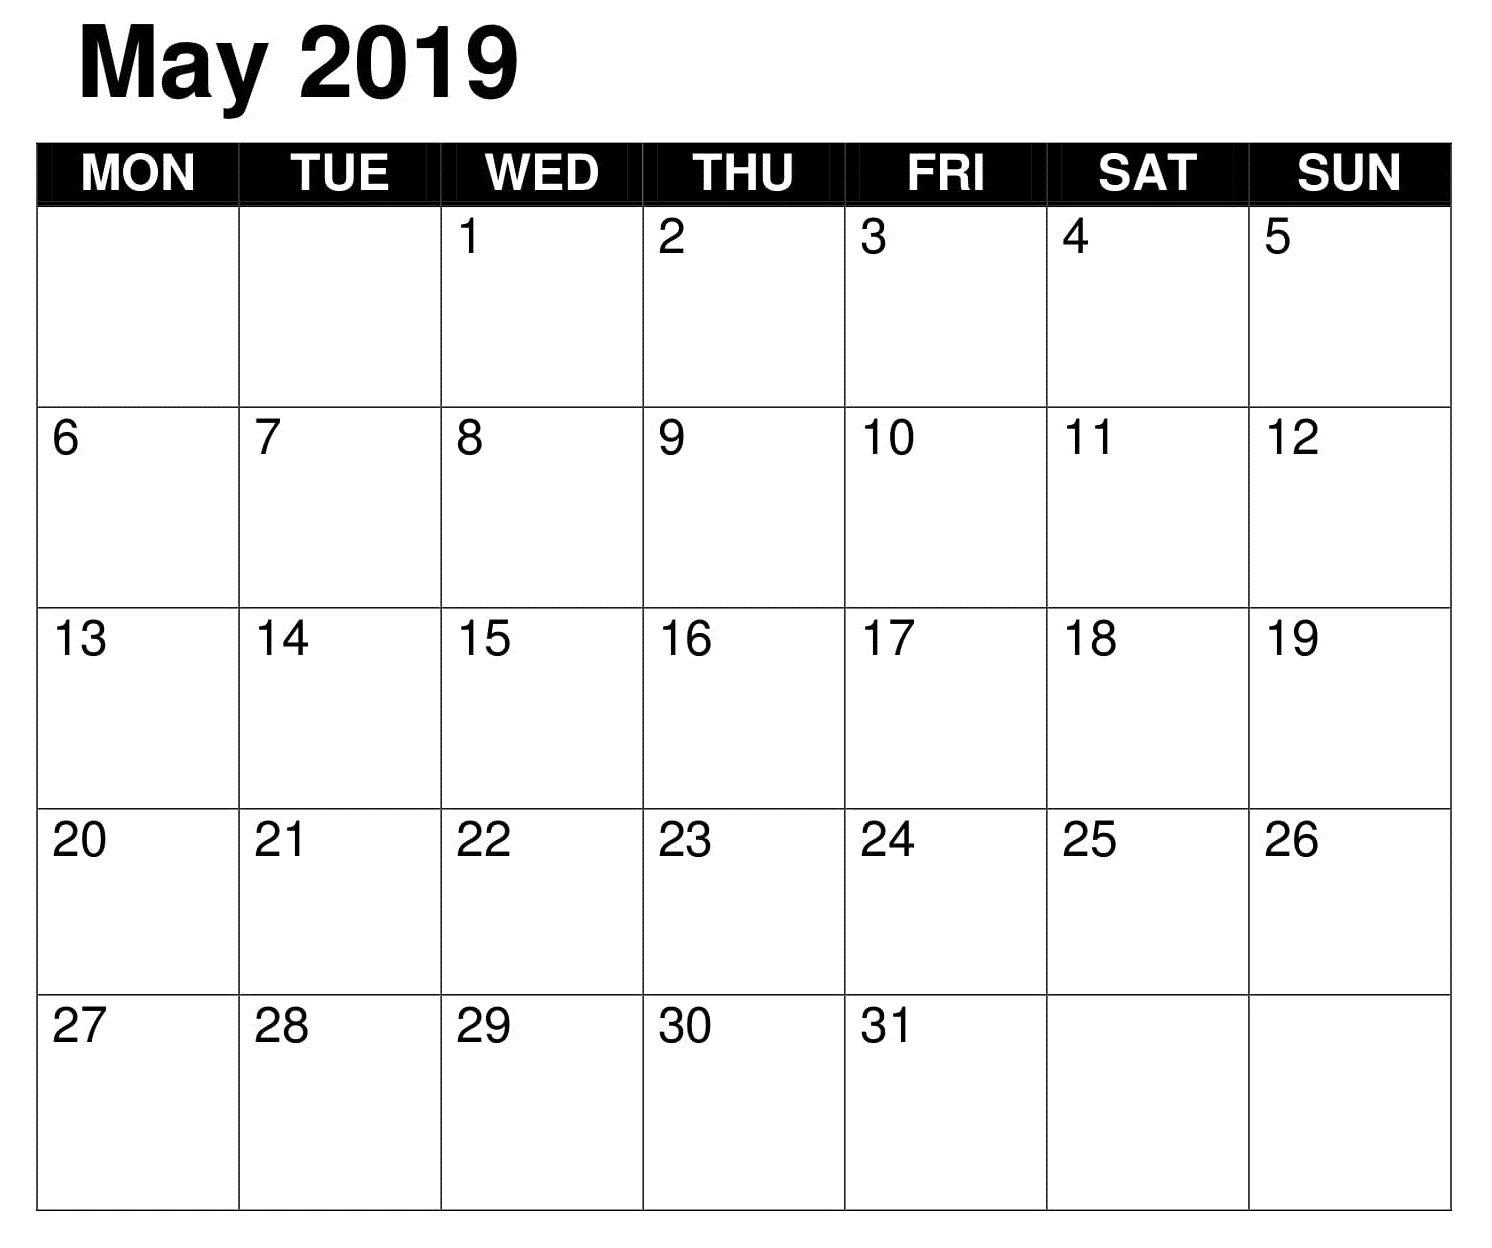 2019 Word Calendar Blank May Calendar 2019 Word | 150+ May 2019 Calendar | Excel